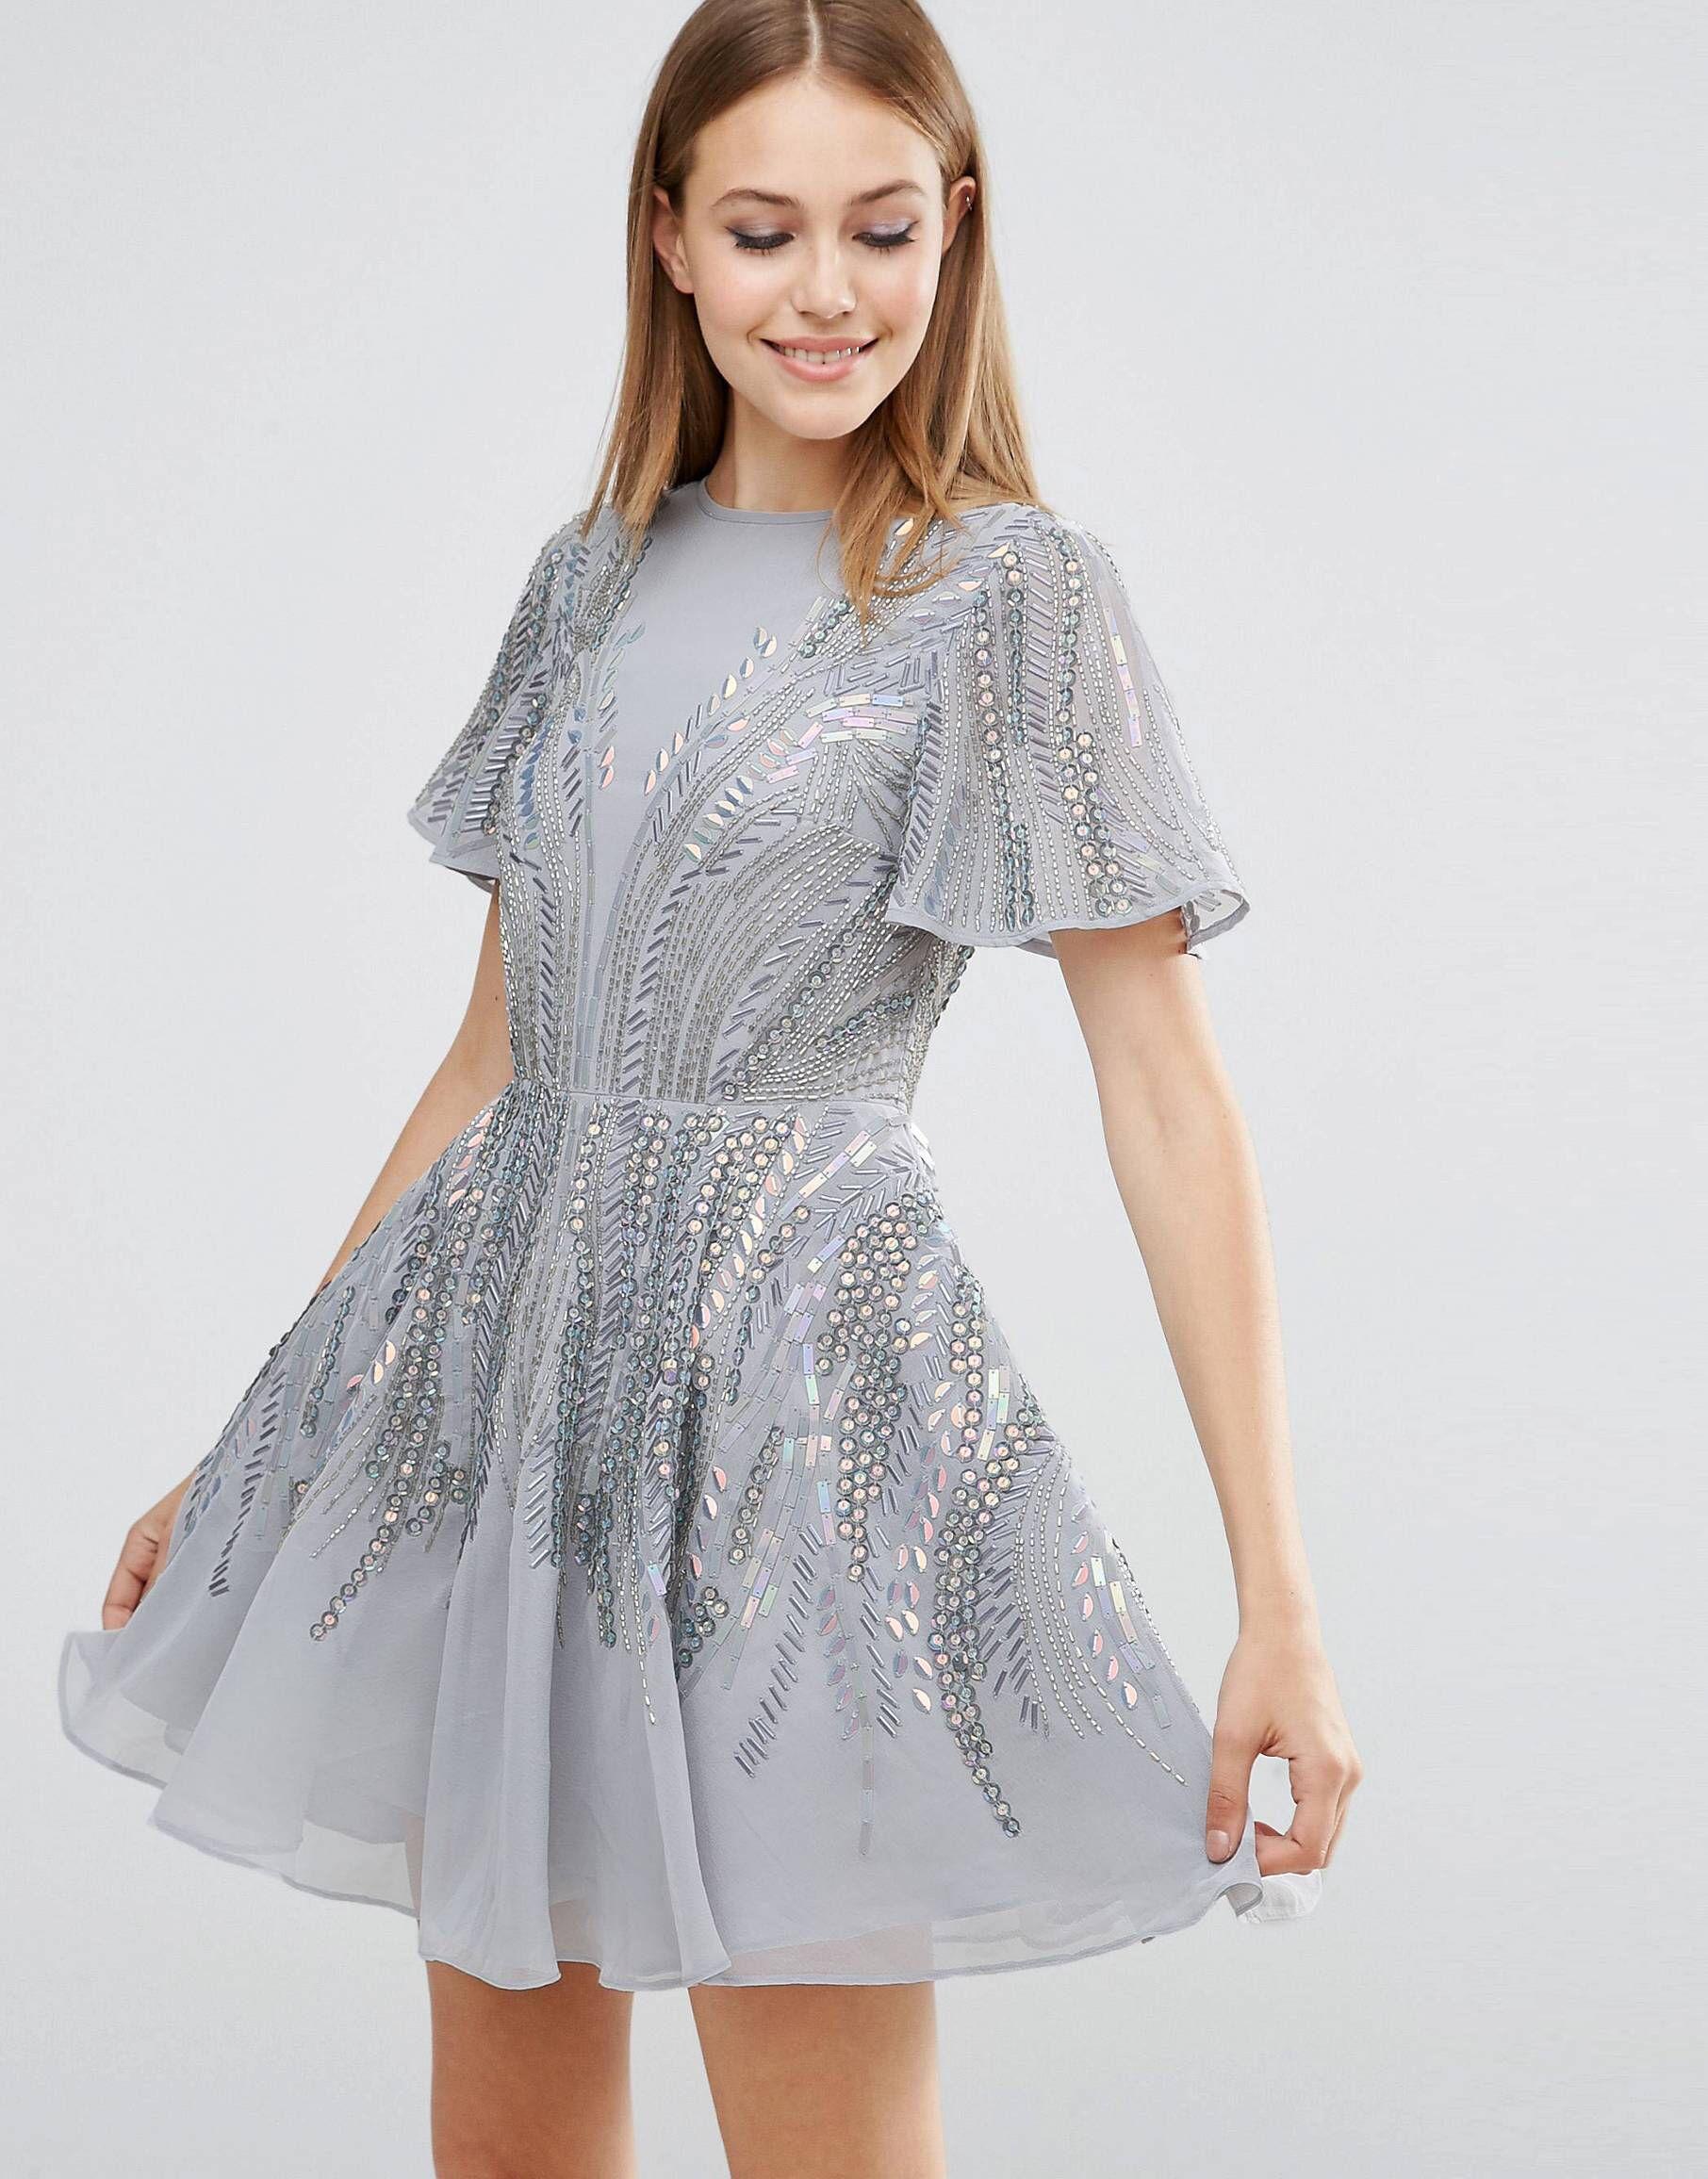 f1ffd5e18c36 Silver sparkle mini skater dress. Grey and embellished.